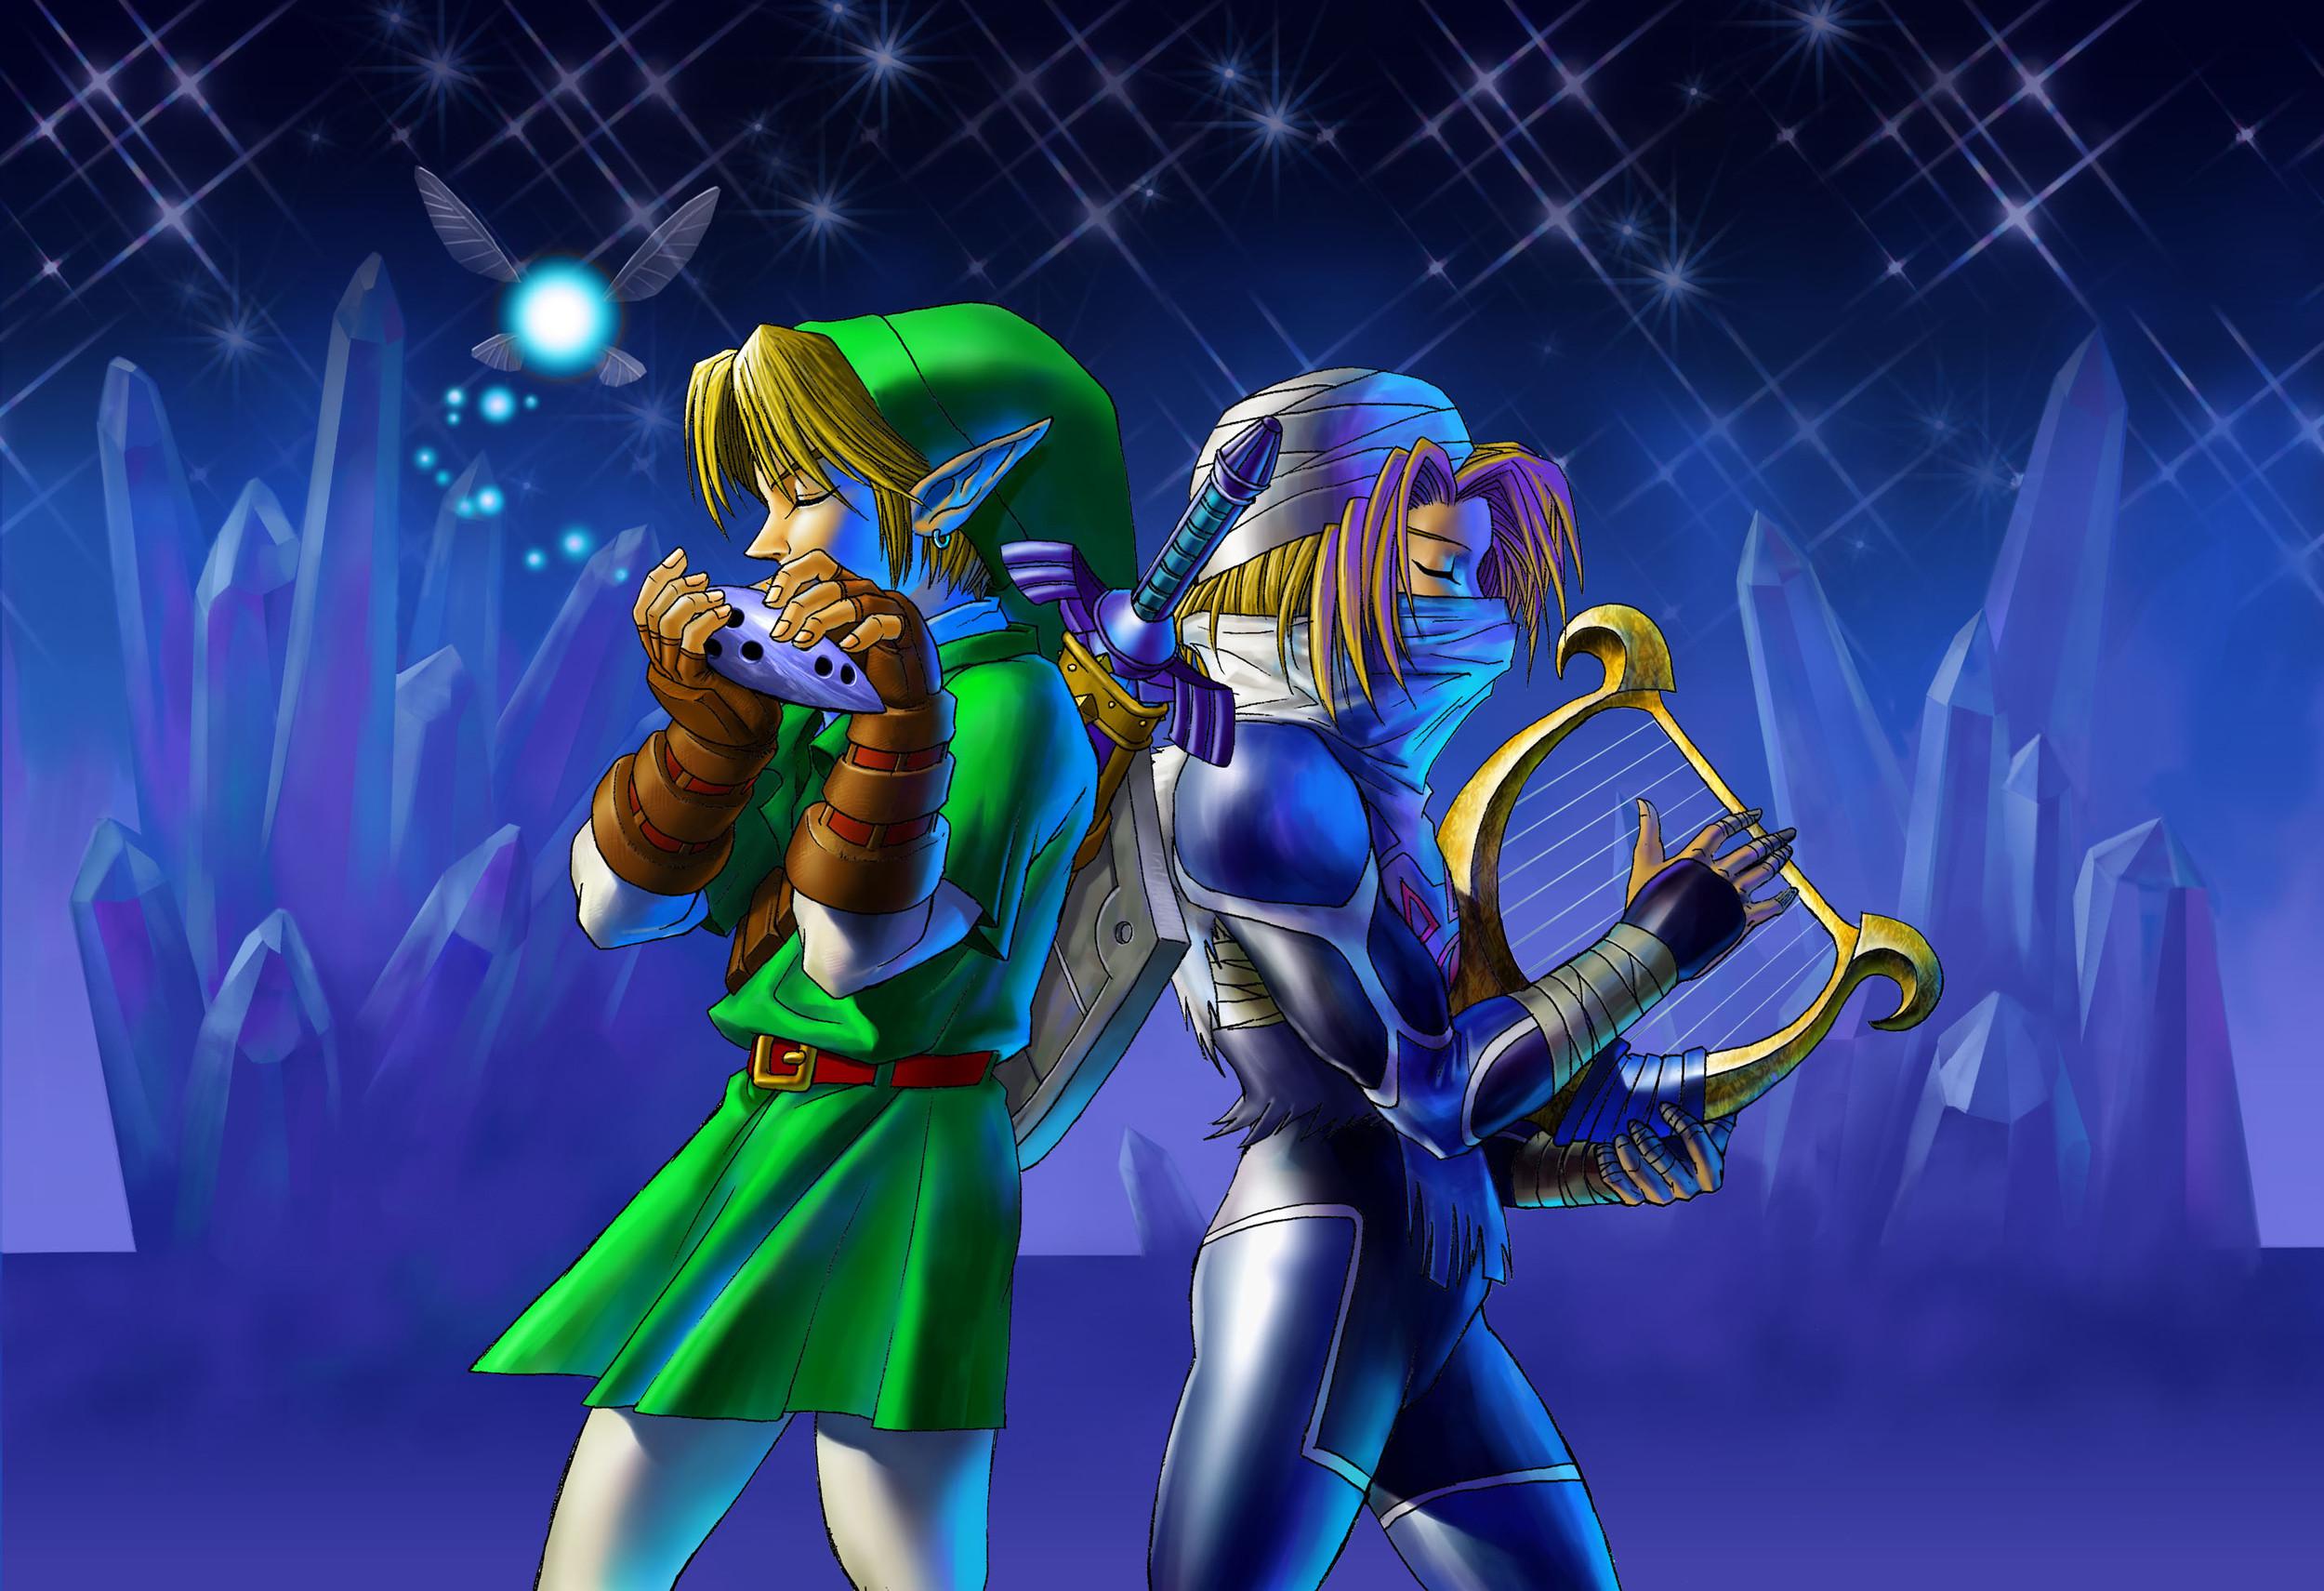 Download Zelda Ocarina of Time 3D Artwork Wallpaper HD & Widescreen The  Legend of Zelda Adventure